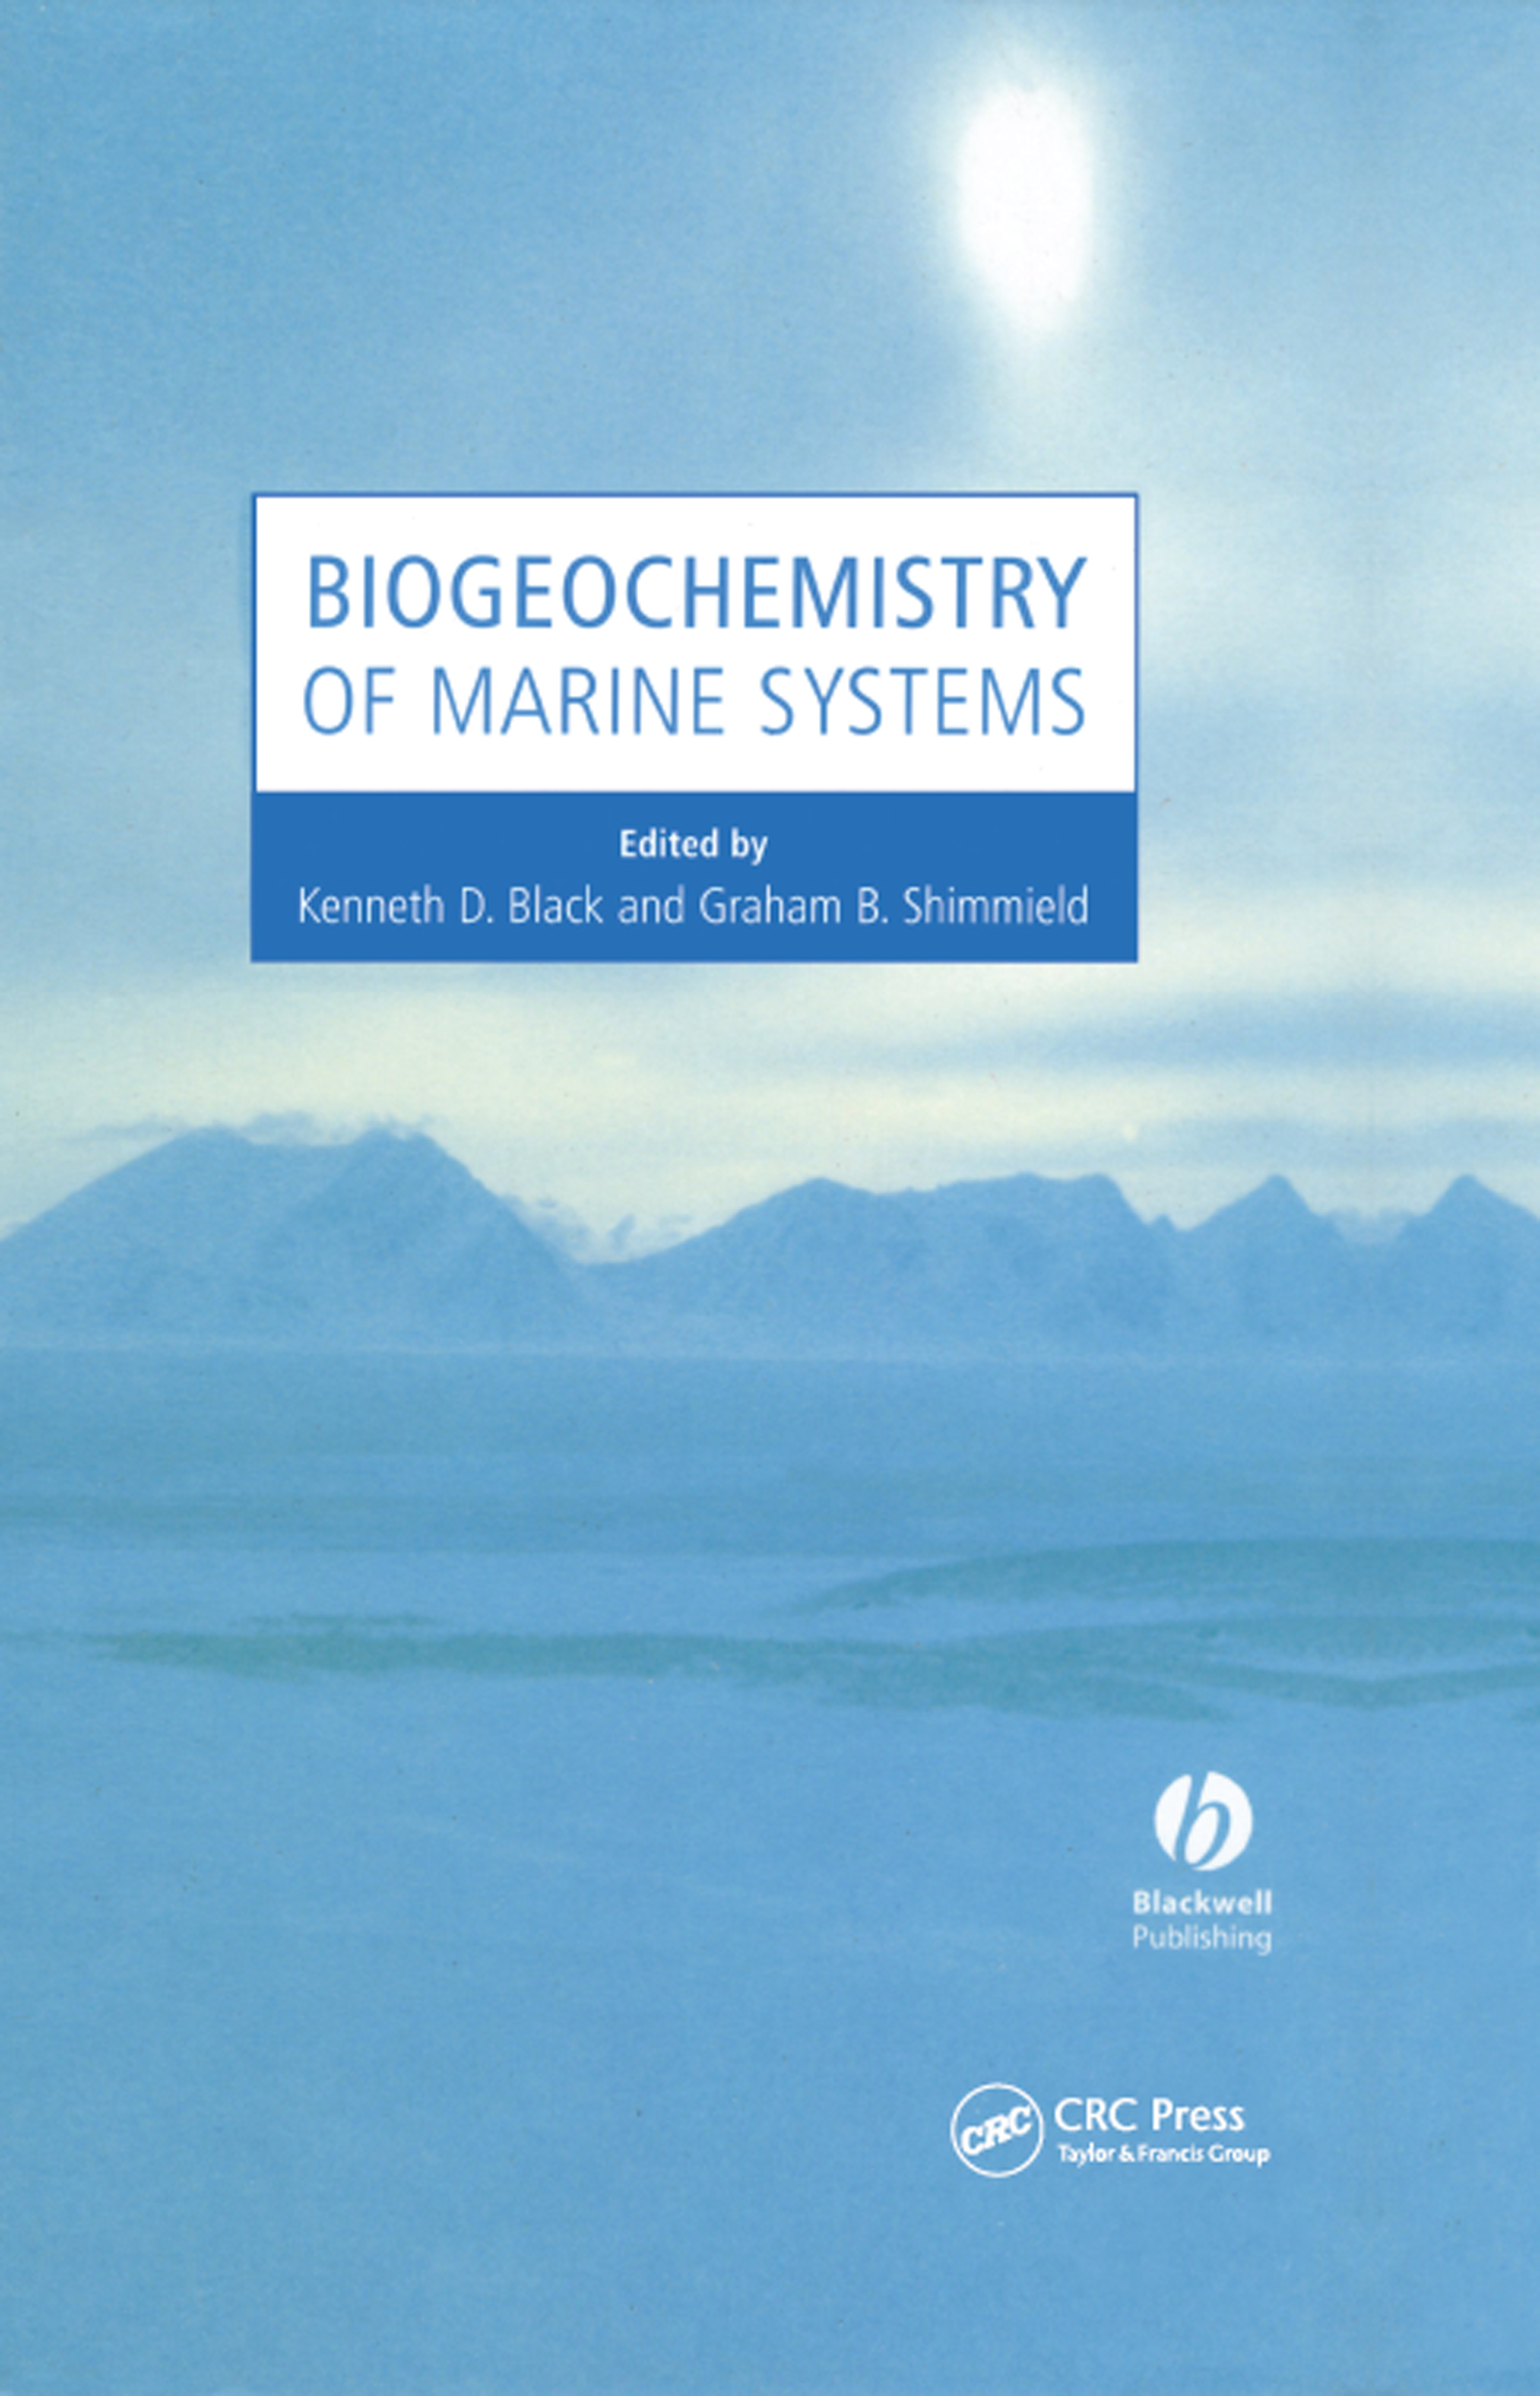 Biogeochemistry of Marine Systems: 1st Edition (Hardback) book cover